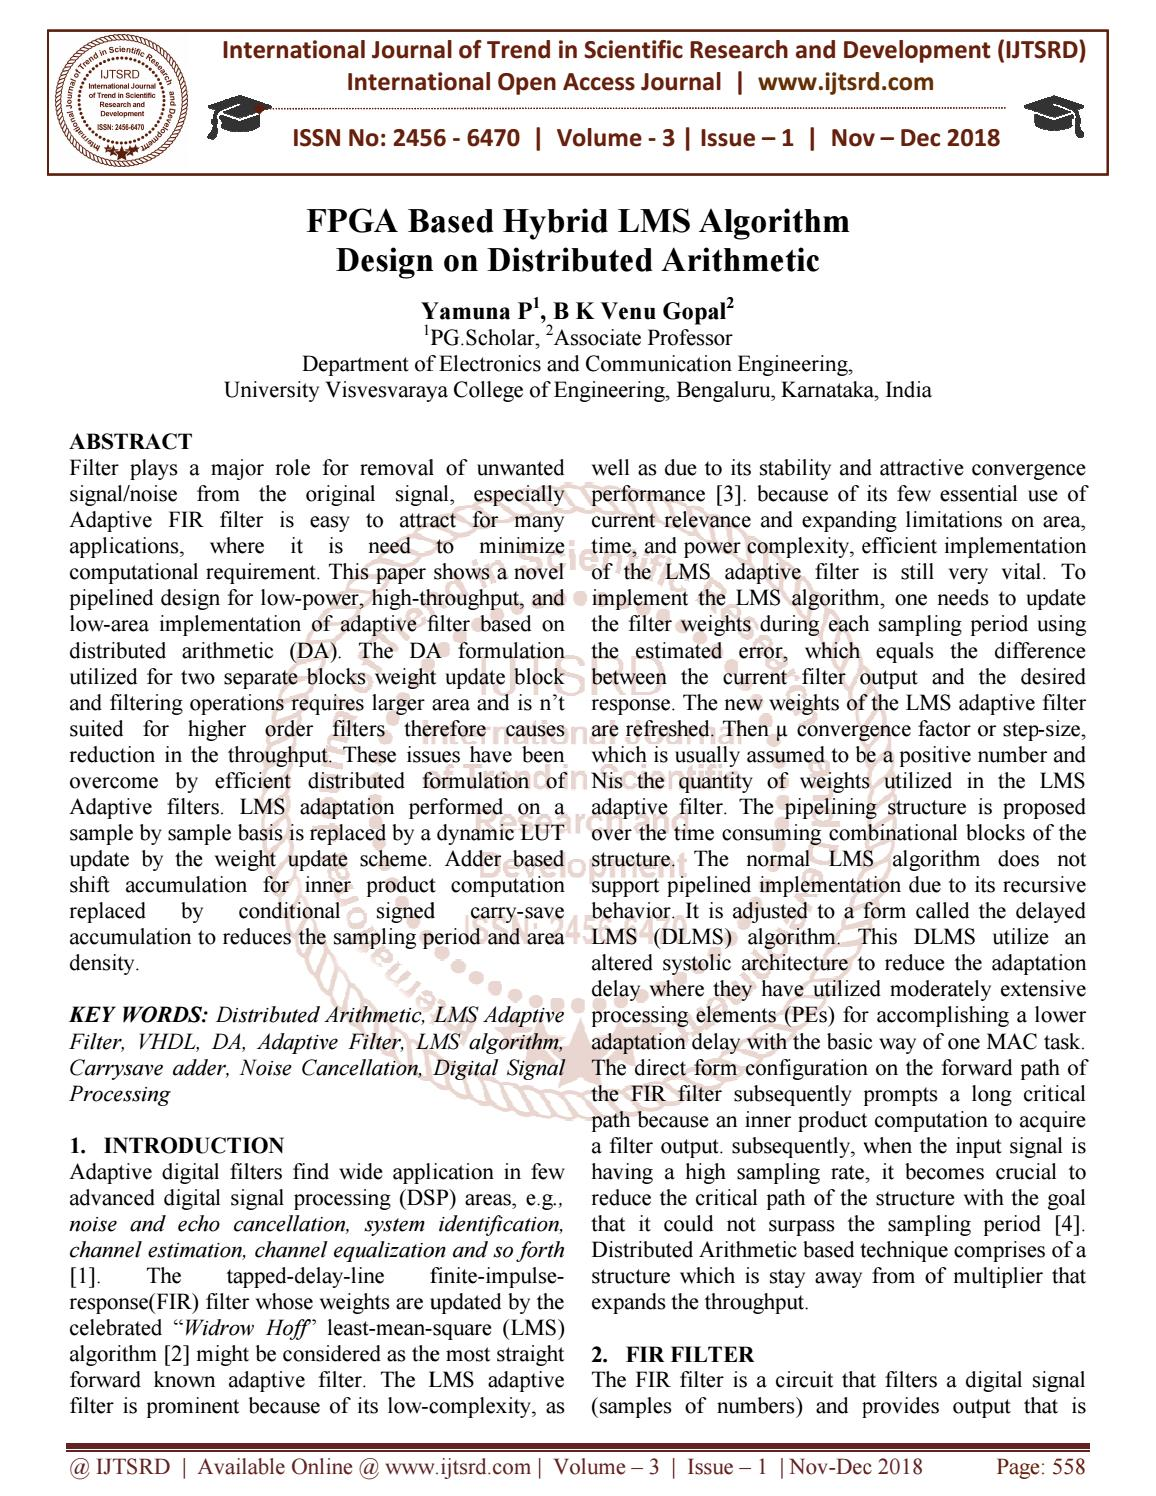 FPGA Based Hybrid LMS Algorithm Design on Distributed Arithmetic